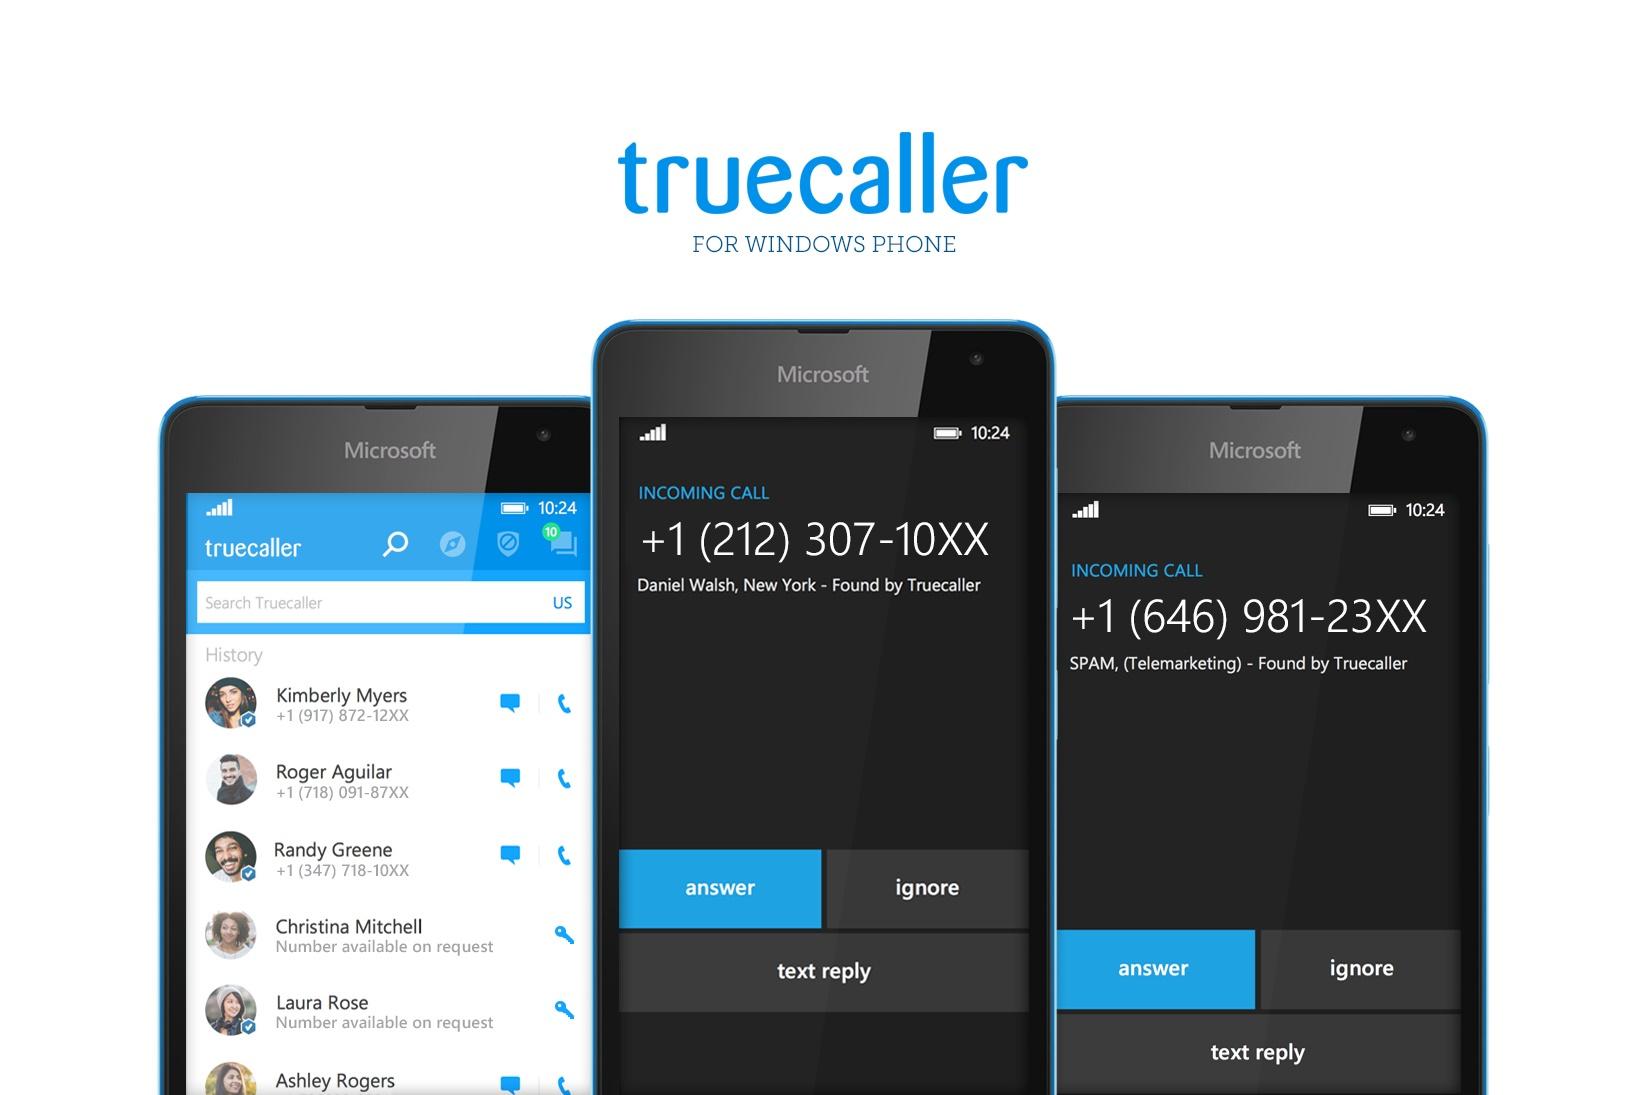 Truecaller for windows phone